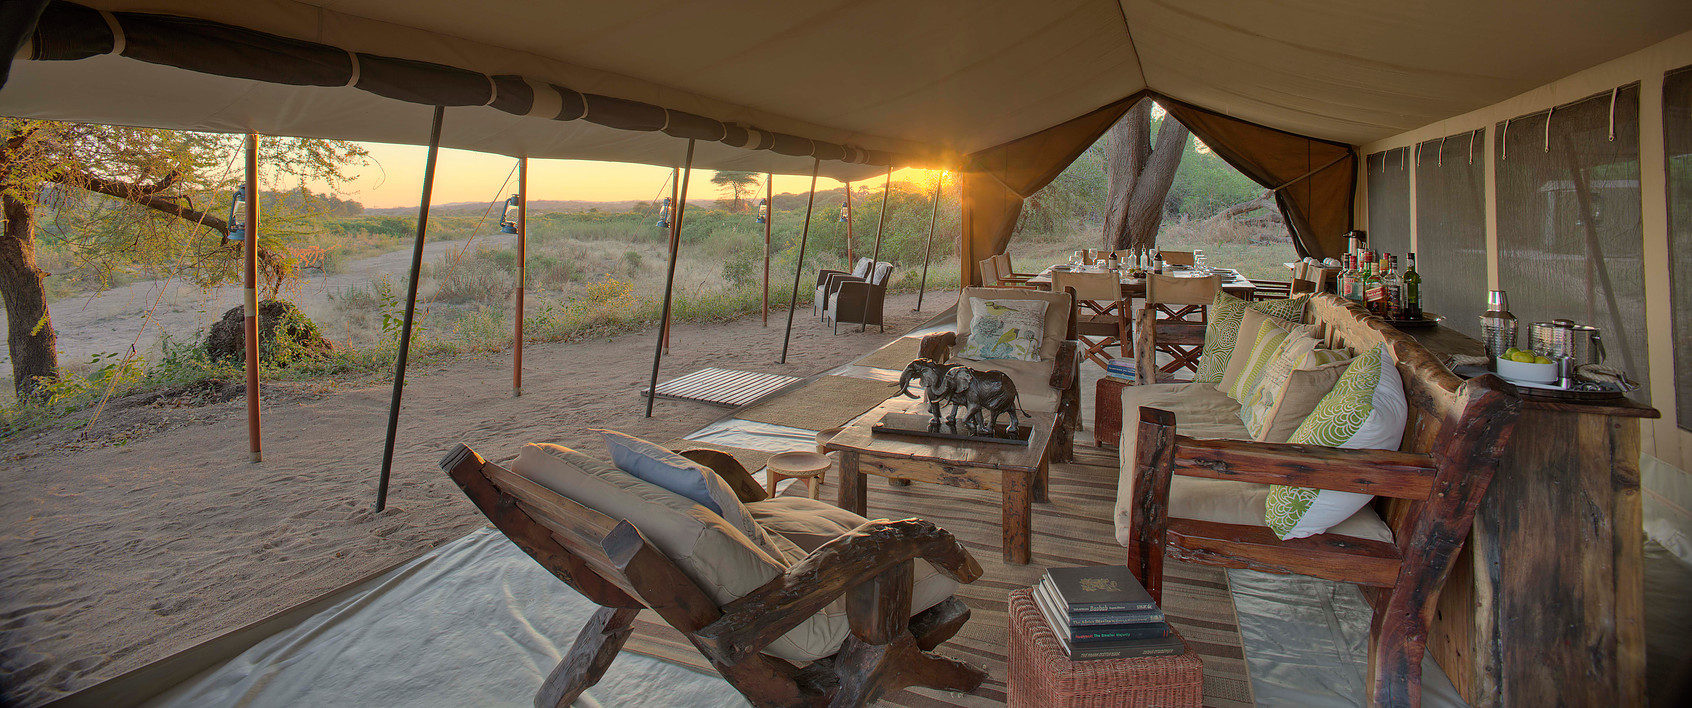 Safari à pied à Ruaha - tente Kichaka Expeditions